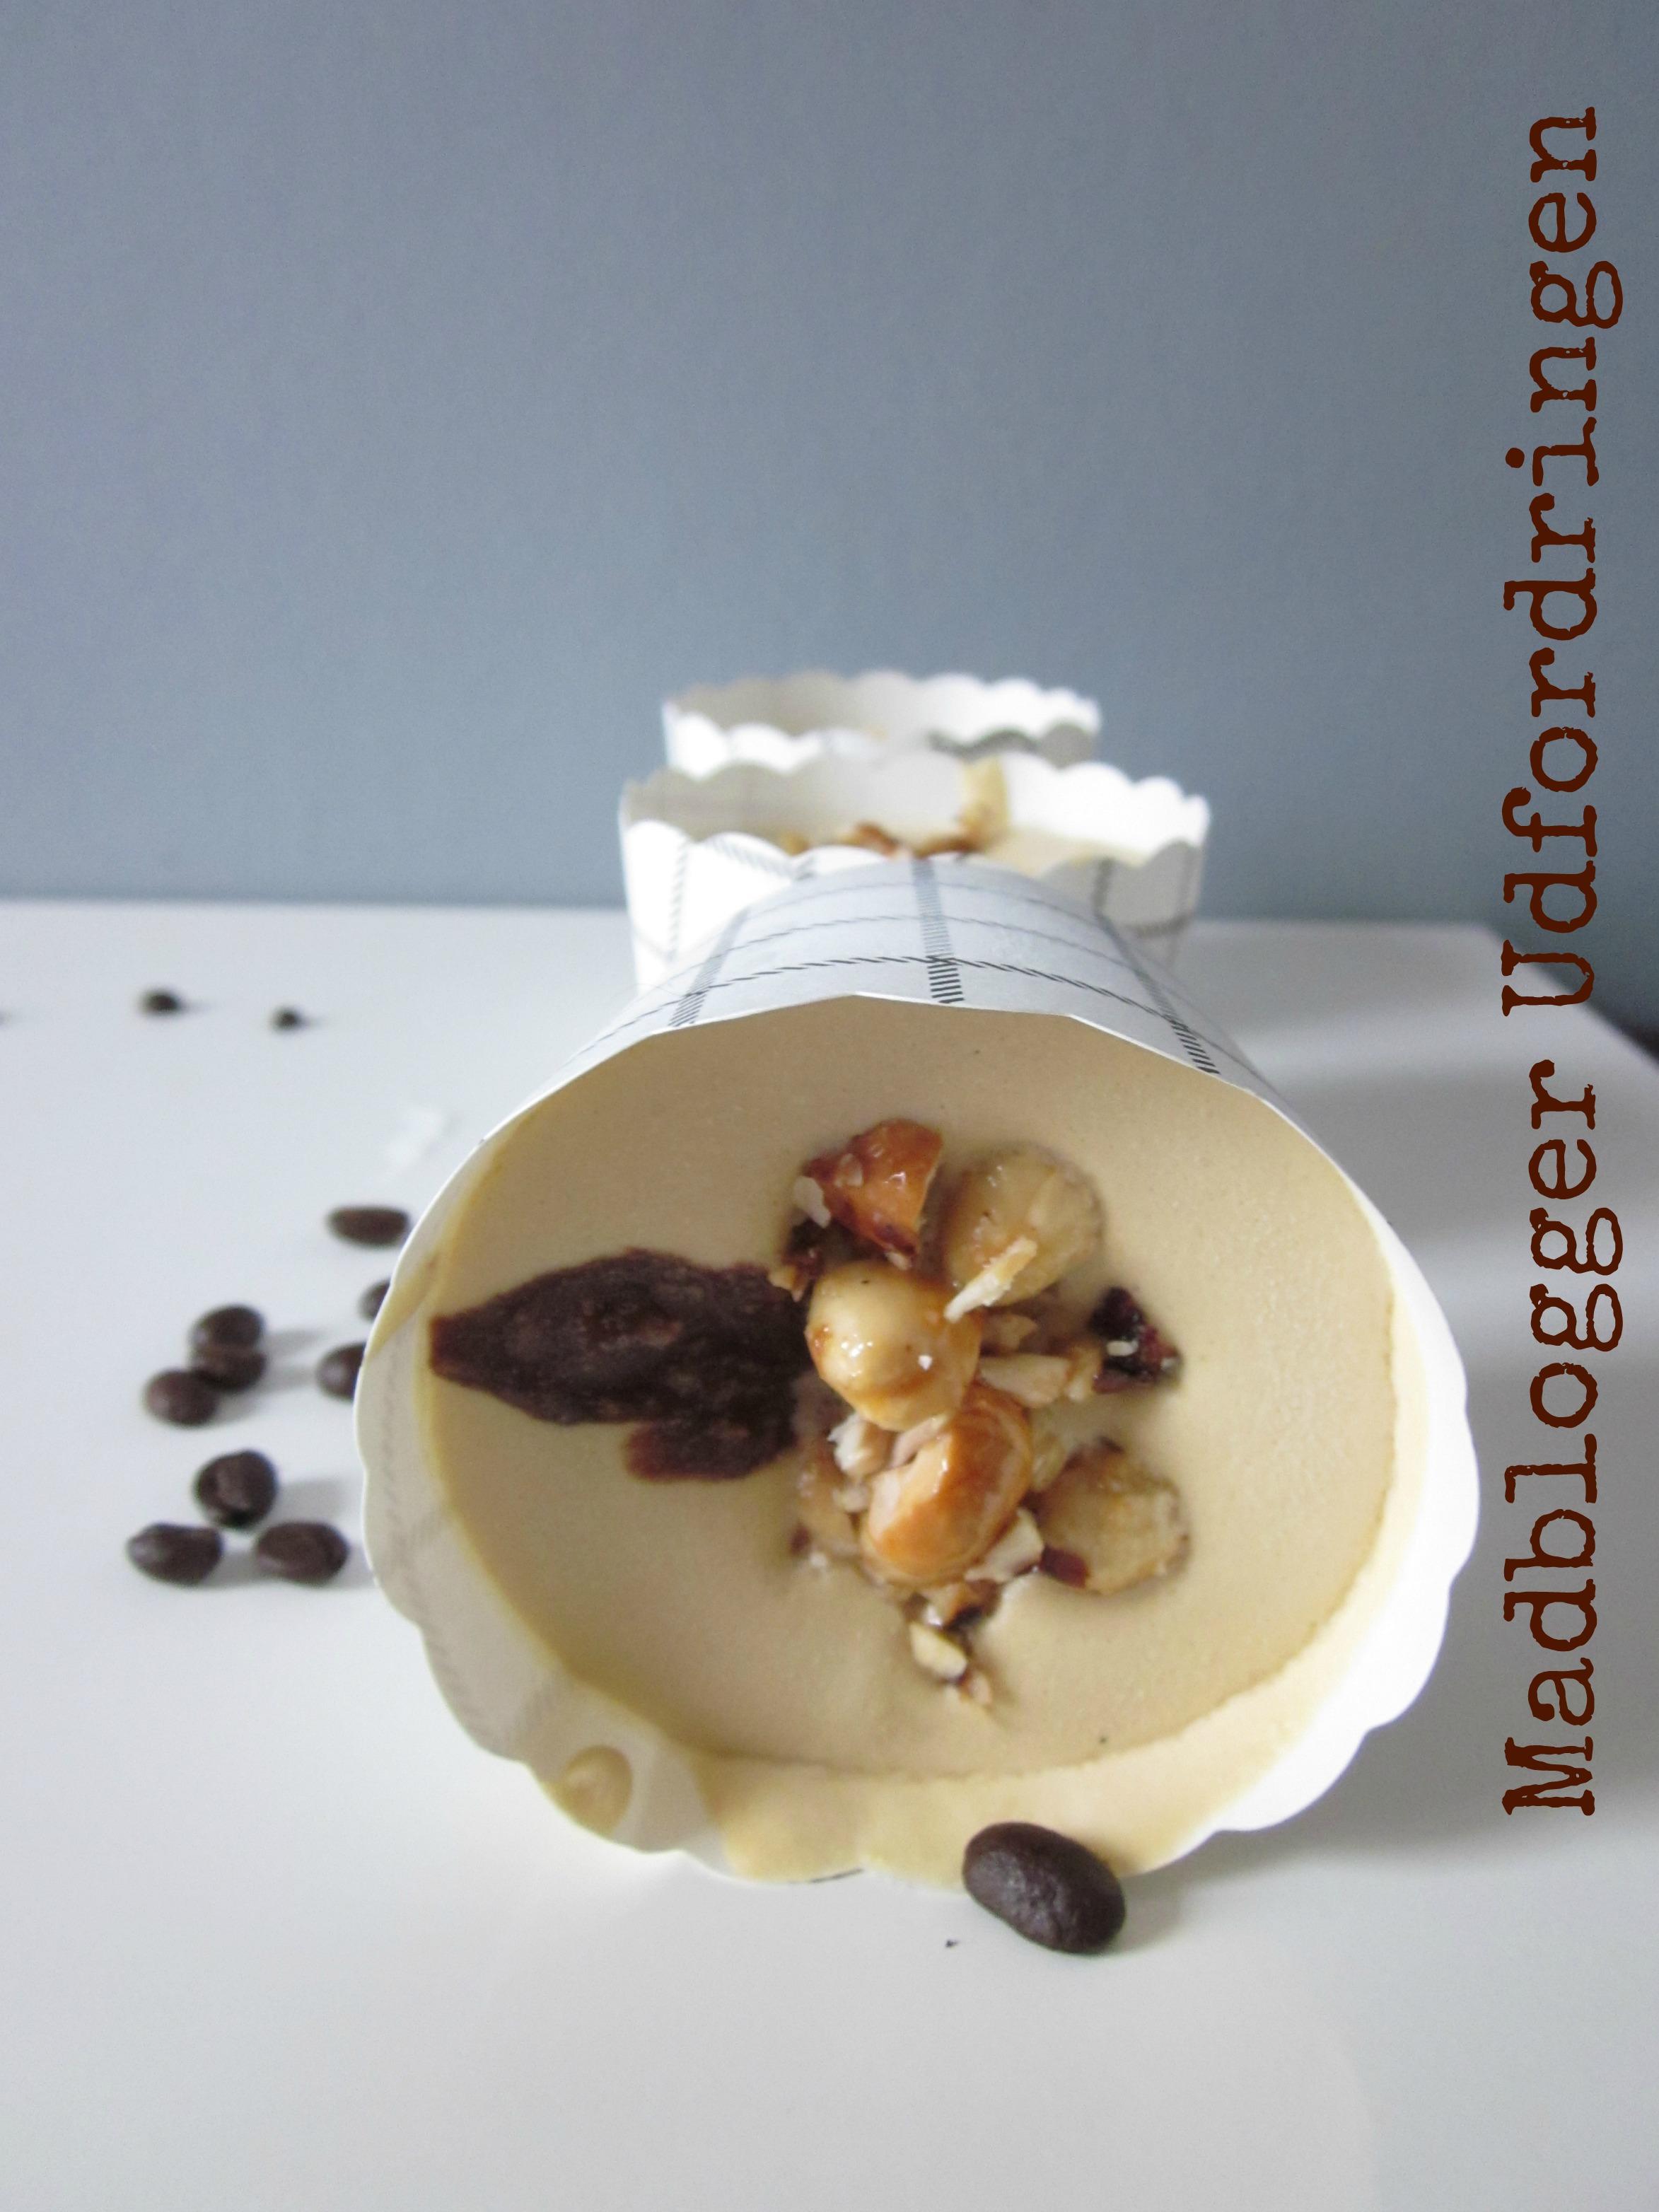 http://lacucinanada.com/2013/11/03/madblogger-udfordringen-mochaccino-parfait-m-chokoladecreme-og-ristede-hasselnodder/